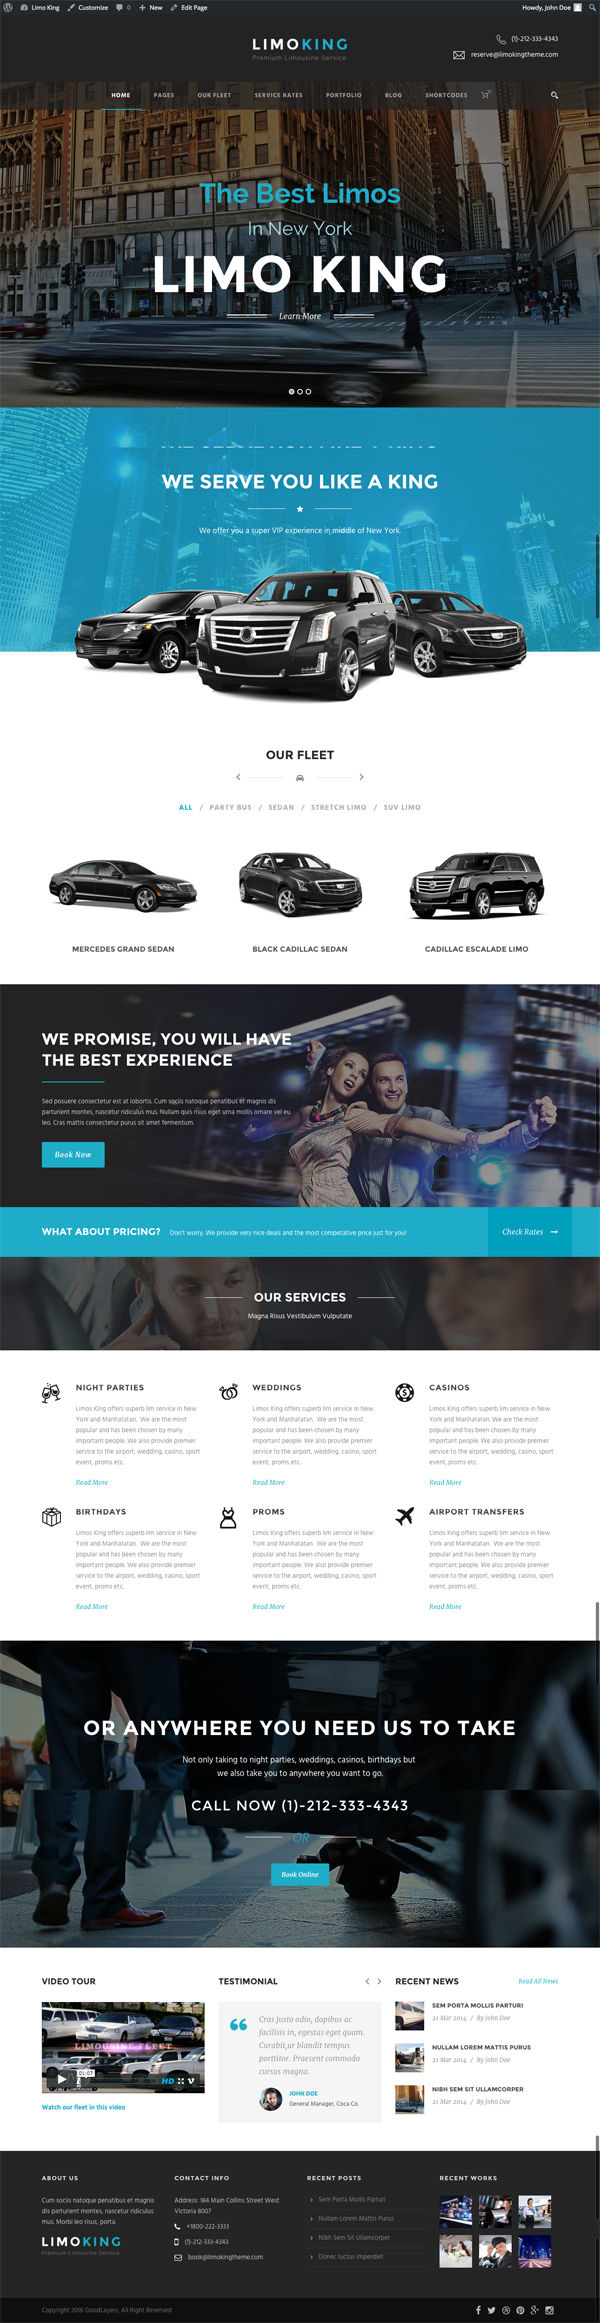 Limo King - Limousine / Transport / Car Hire Theme